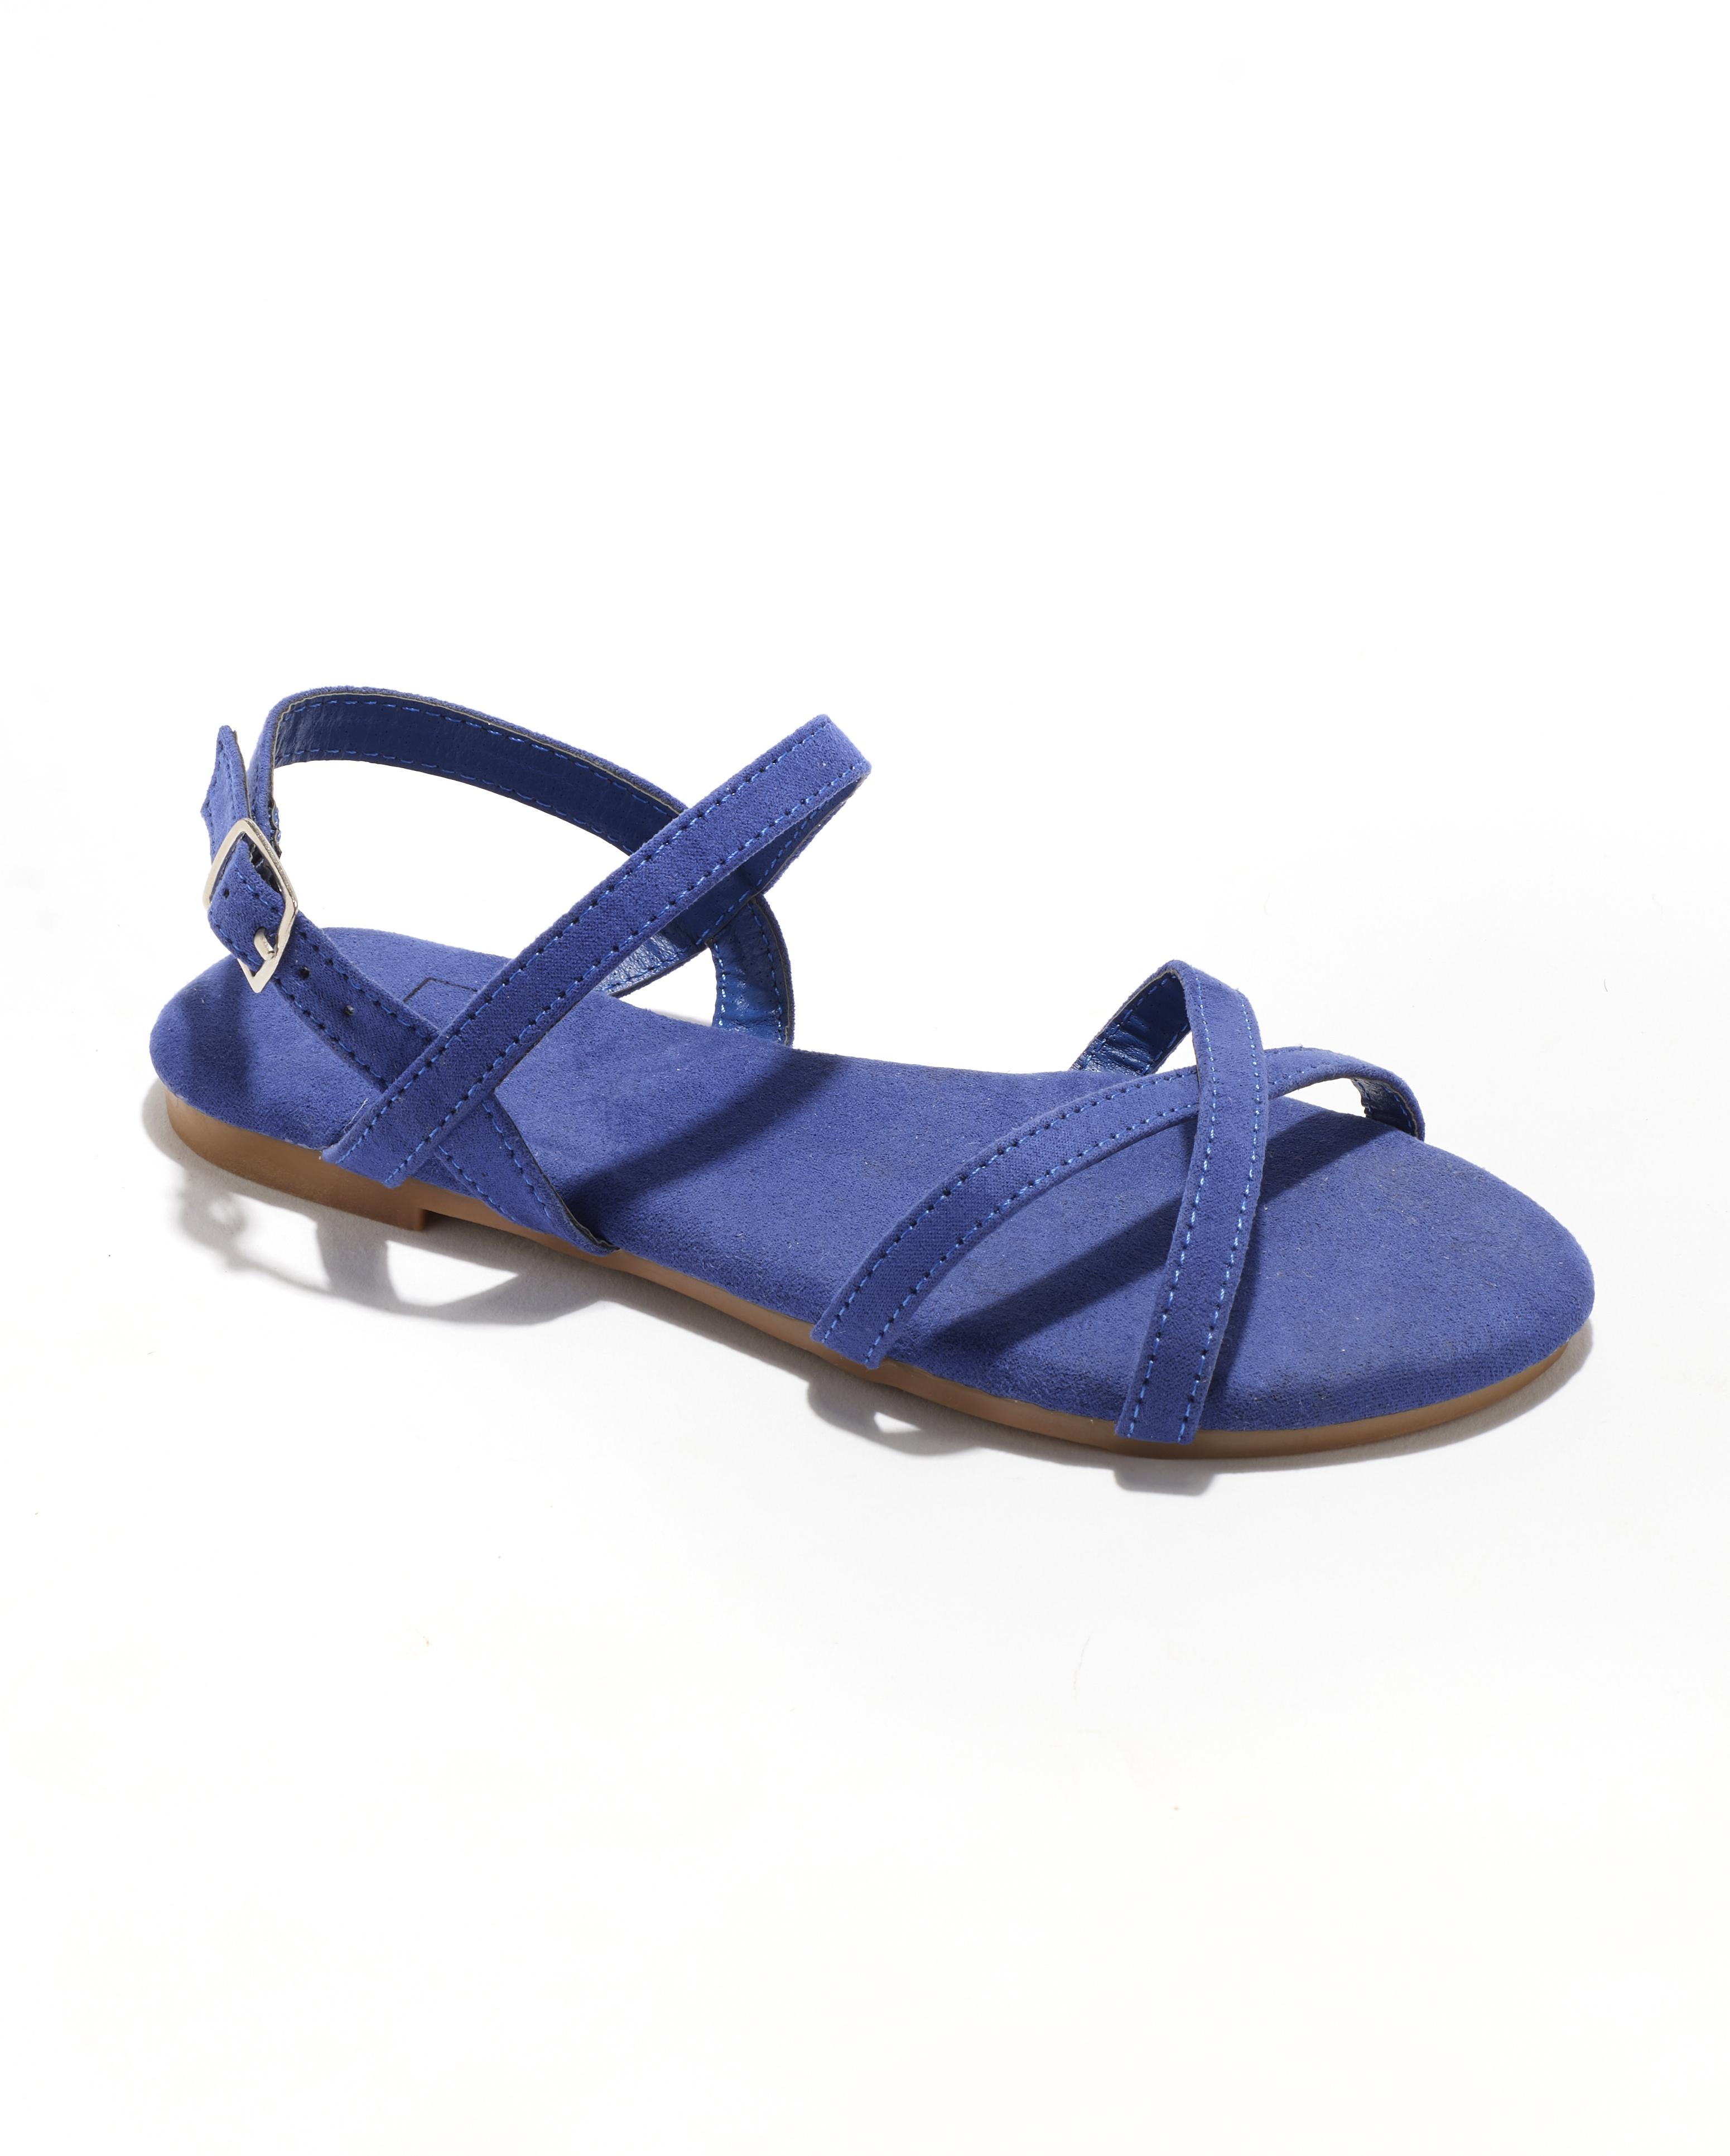 Sandales Fille - Sandale Ouverte Bleu Jina - Sapl Zh3